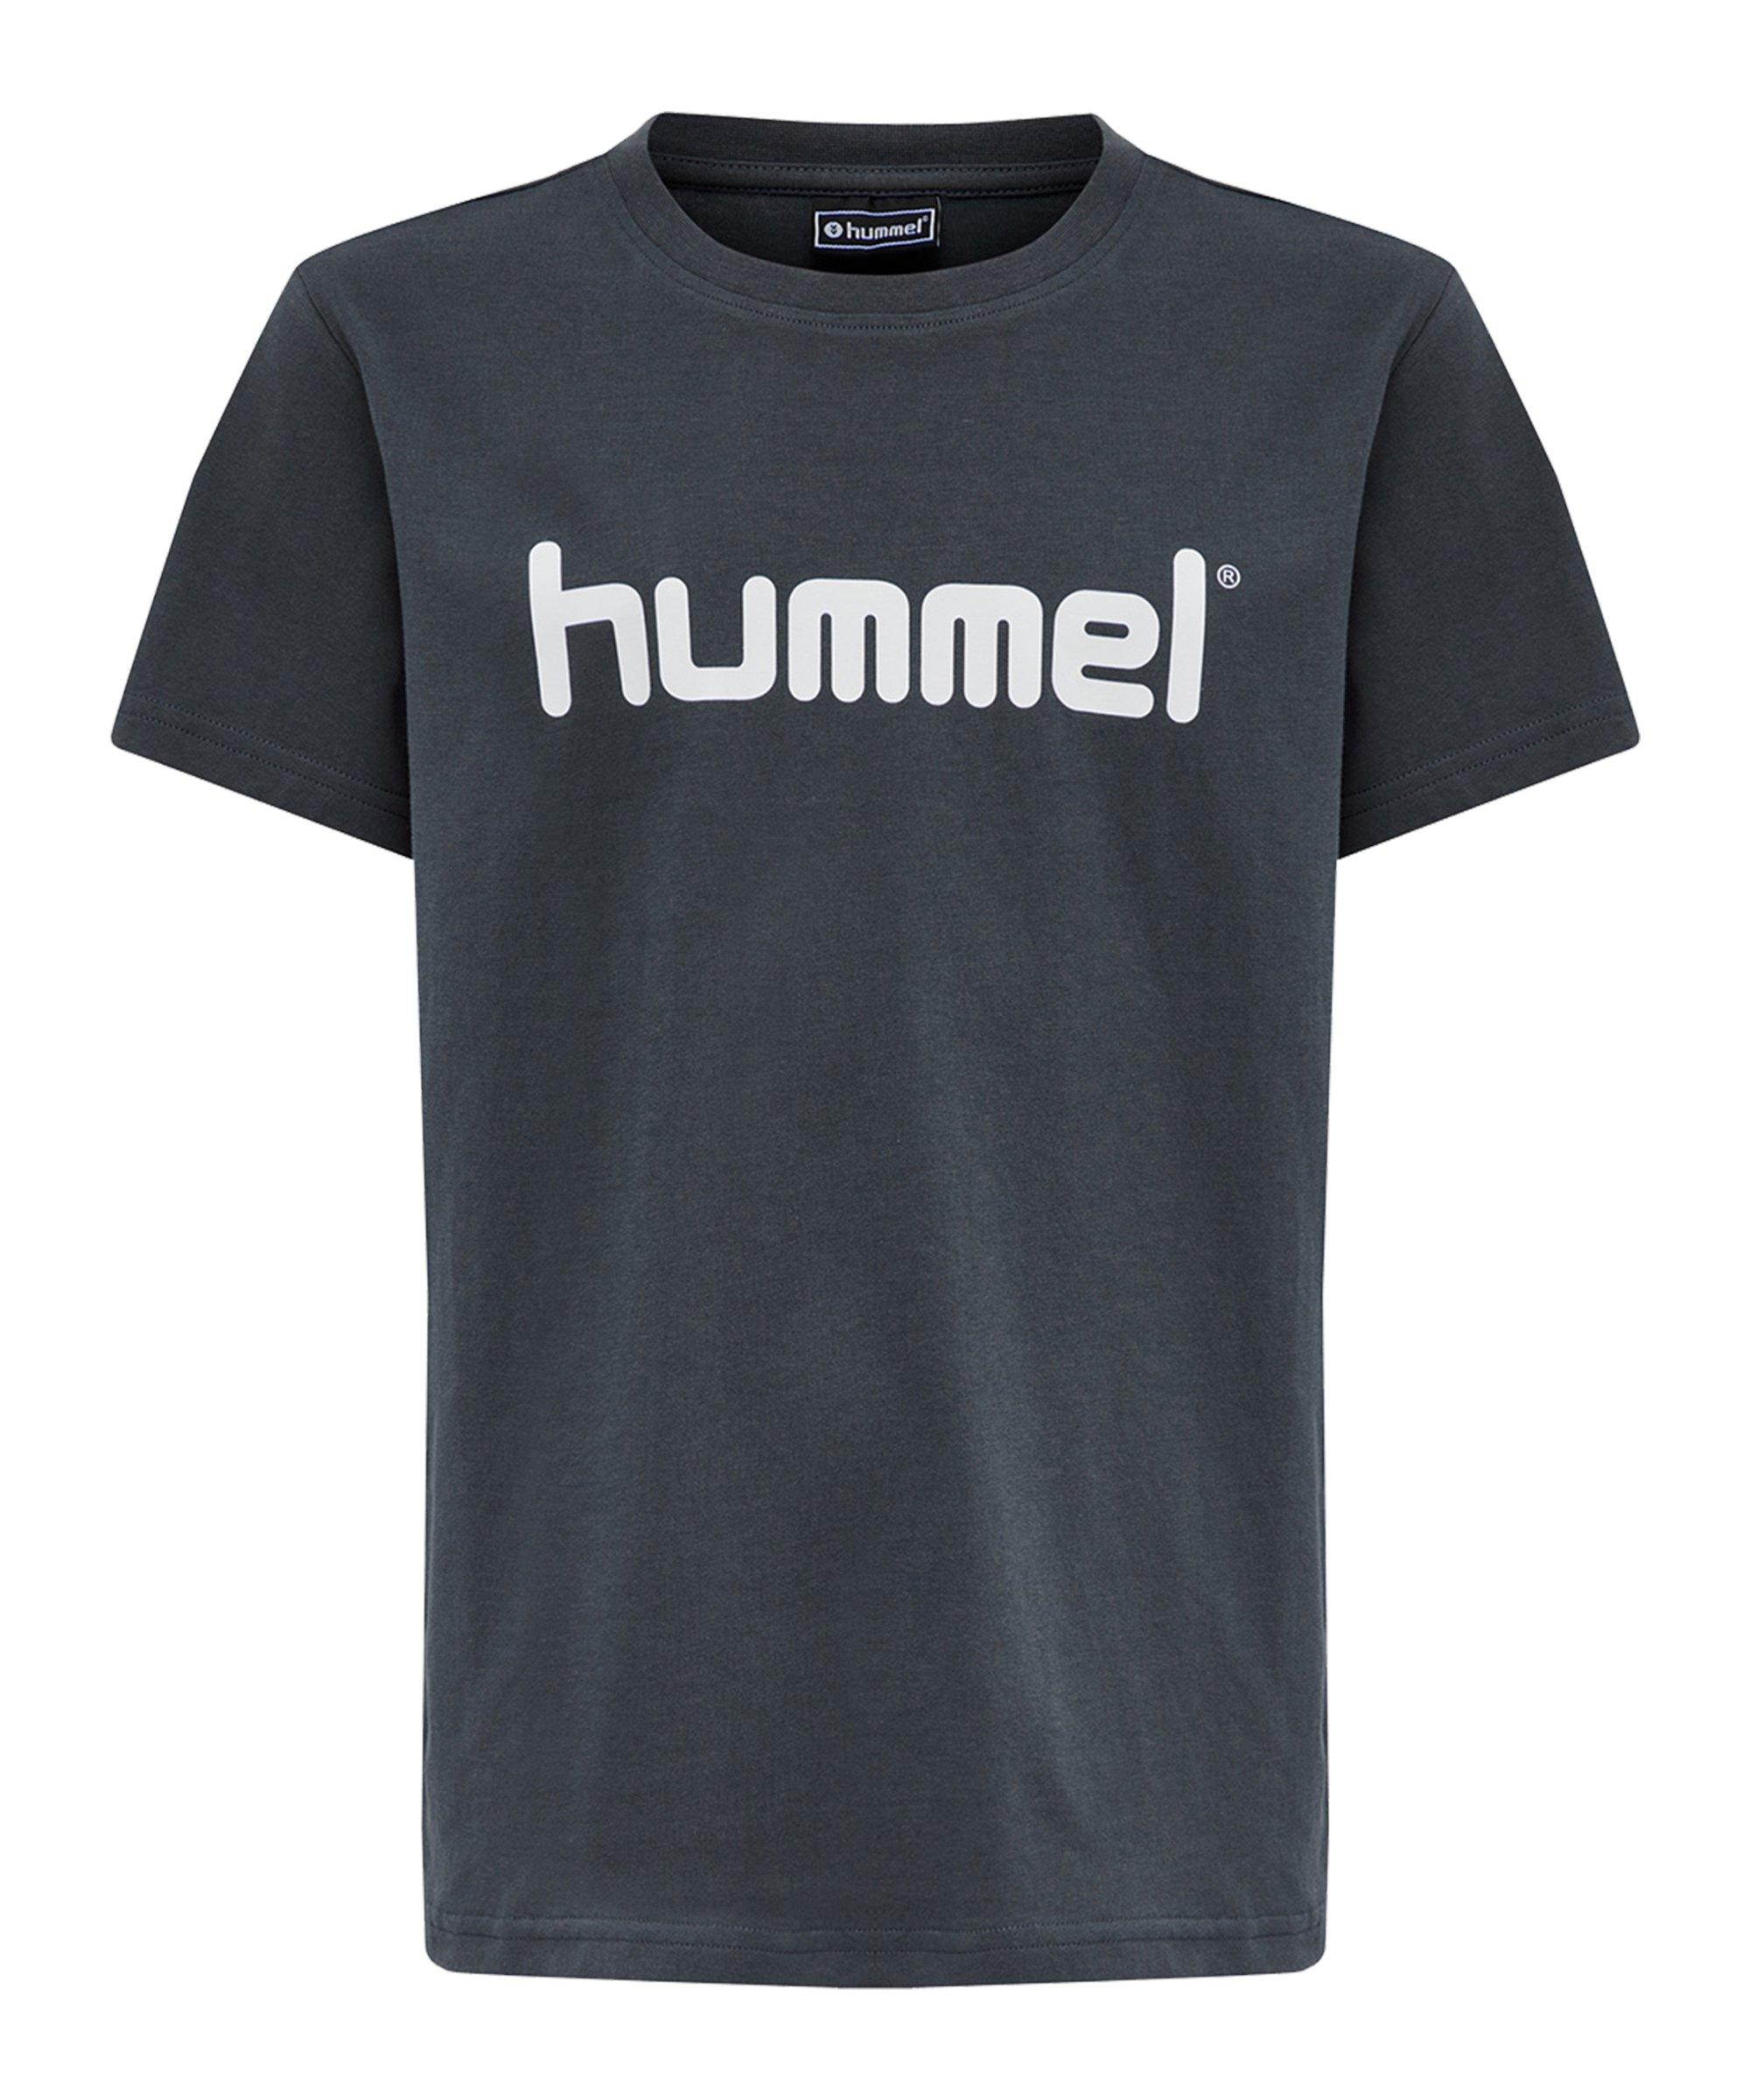 Hummel Cotton T-Shirt Logo Kids Grau F8571 - grau